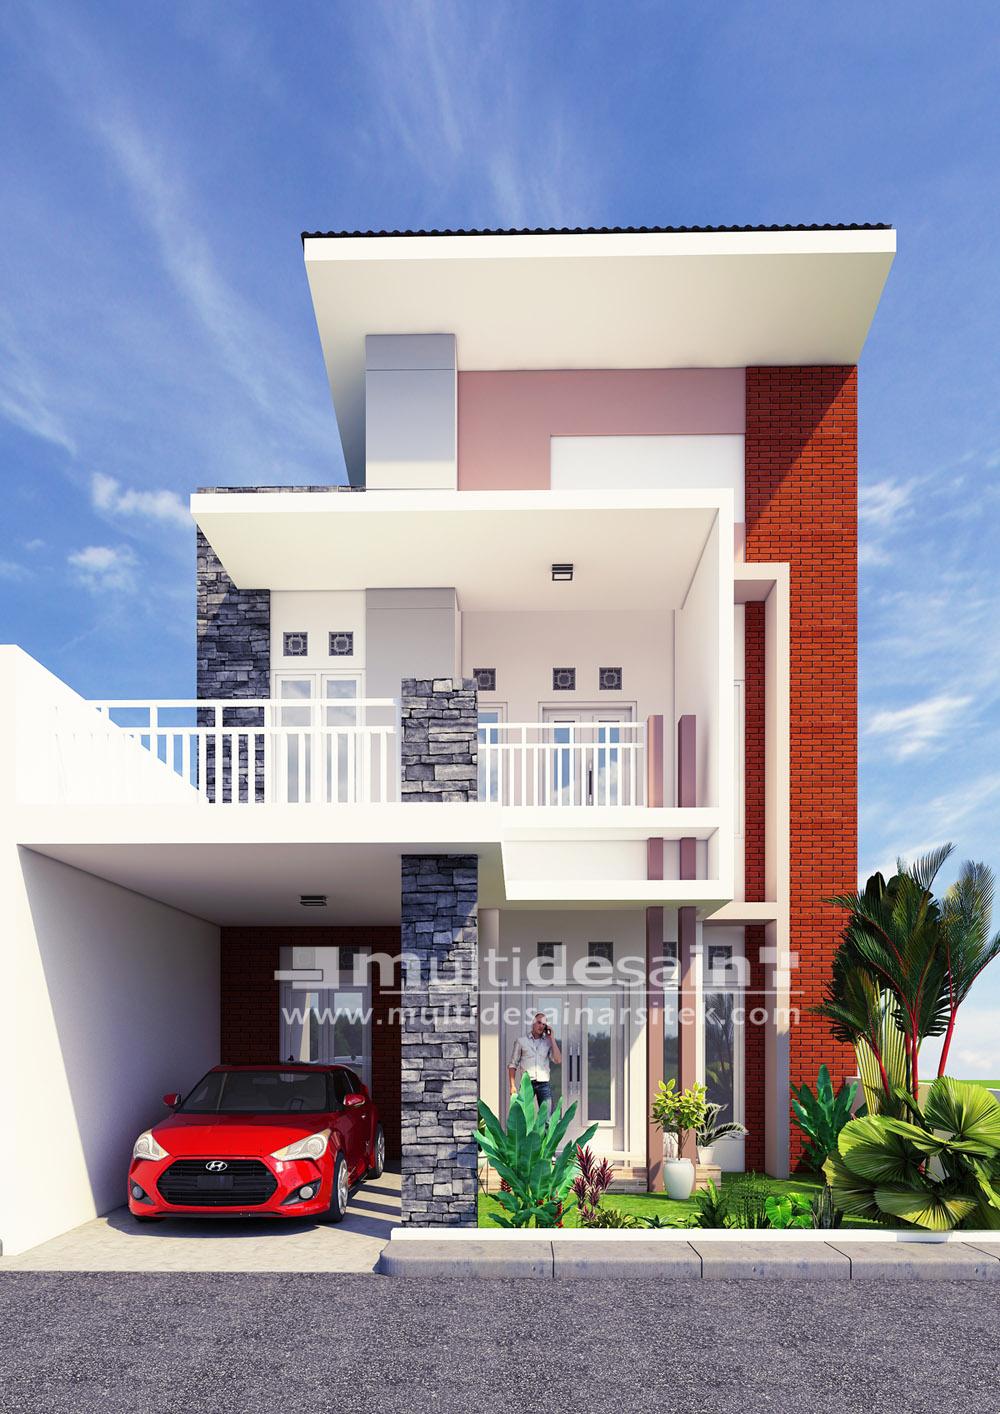 Rumah Minimalis Modern 2 Lantai Di Surabaya Multidesain Arsitek